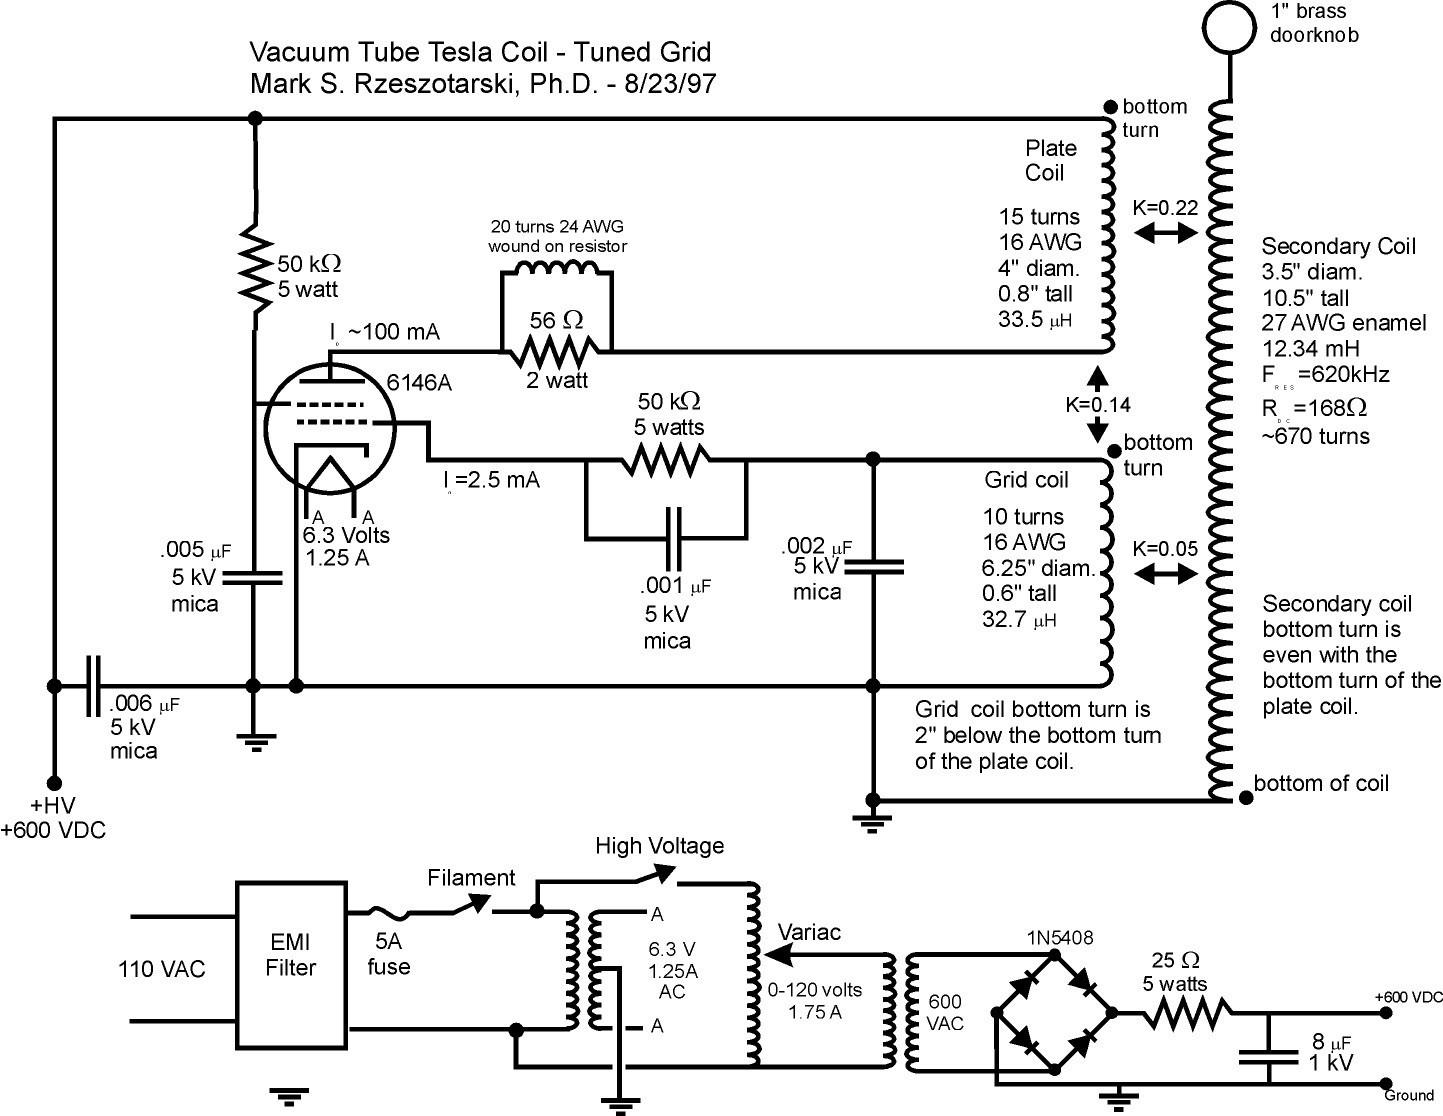 hight resolution of miniature vacuum tube tesla coil